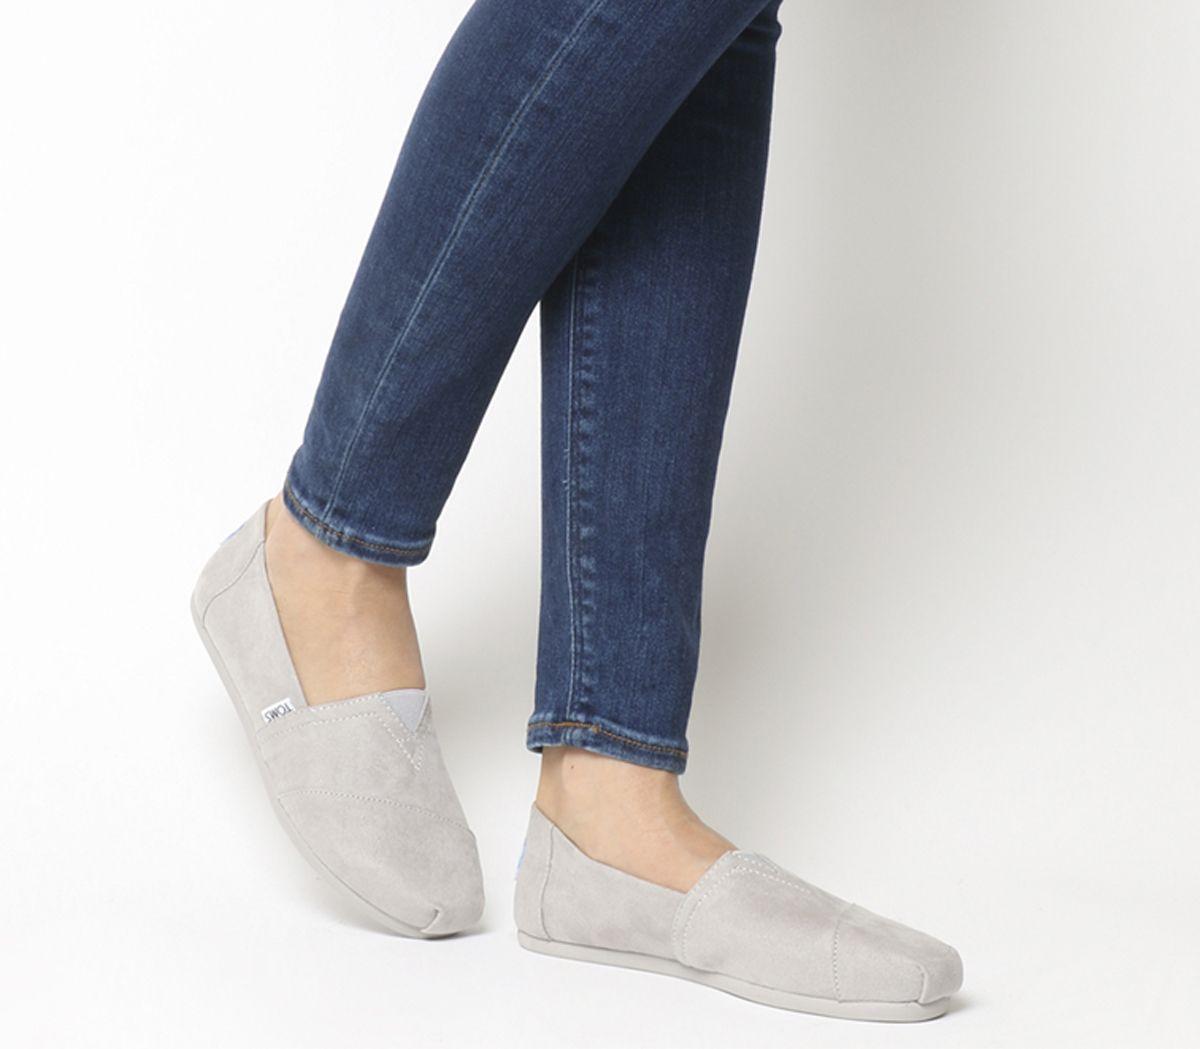 Womens-Toms-Seasonal-Classic-Slip-On-Drizzle-Grey-Flats thumbnail 3